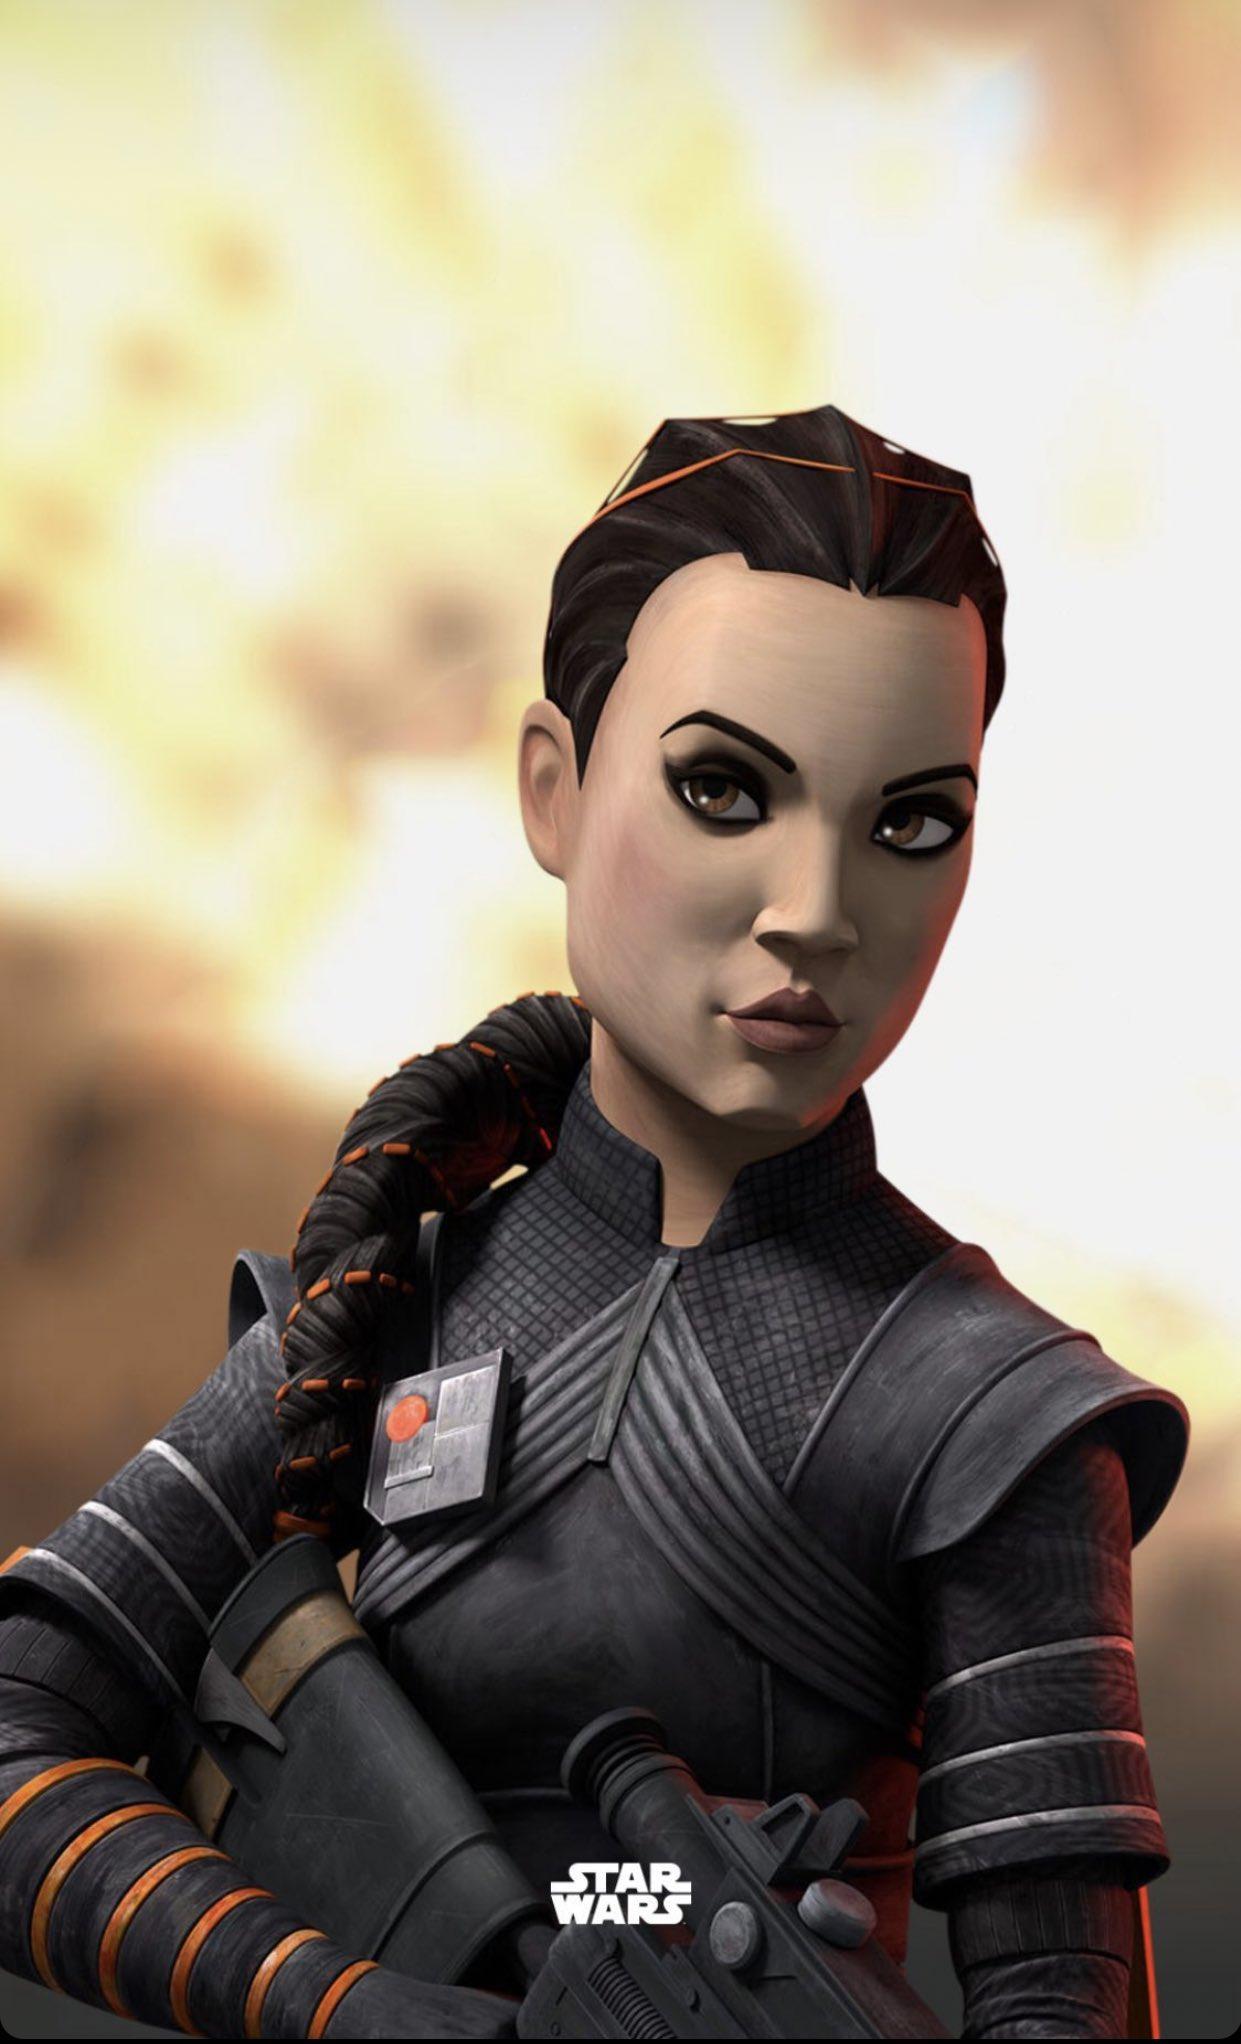 Star Wars : The Bad Batch [Lucasfilm - 2021] EvamSMtVcAMhWKu?format=jpg&name=large